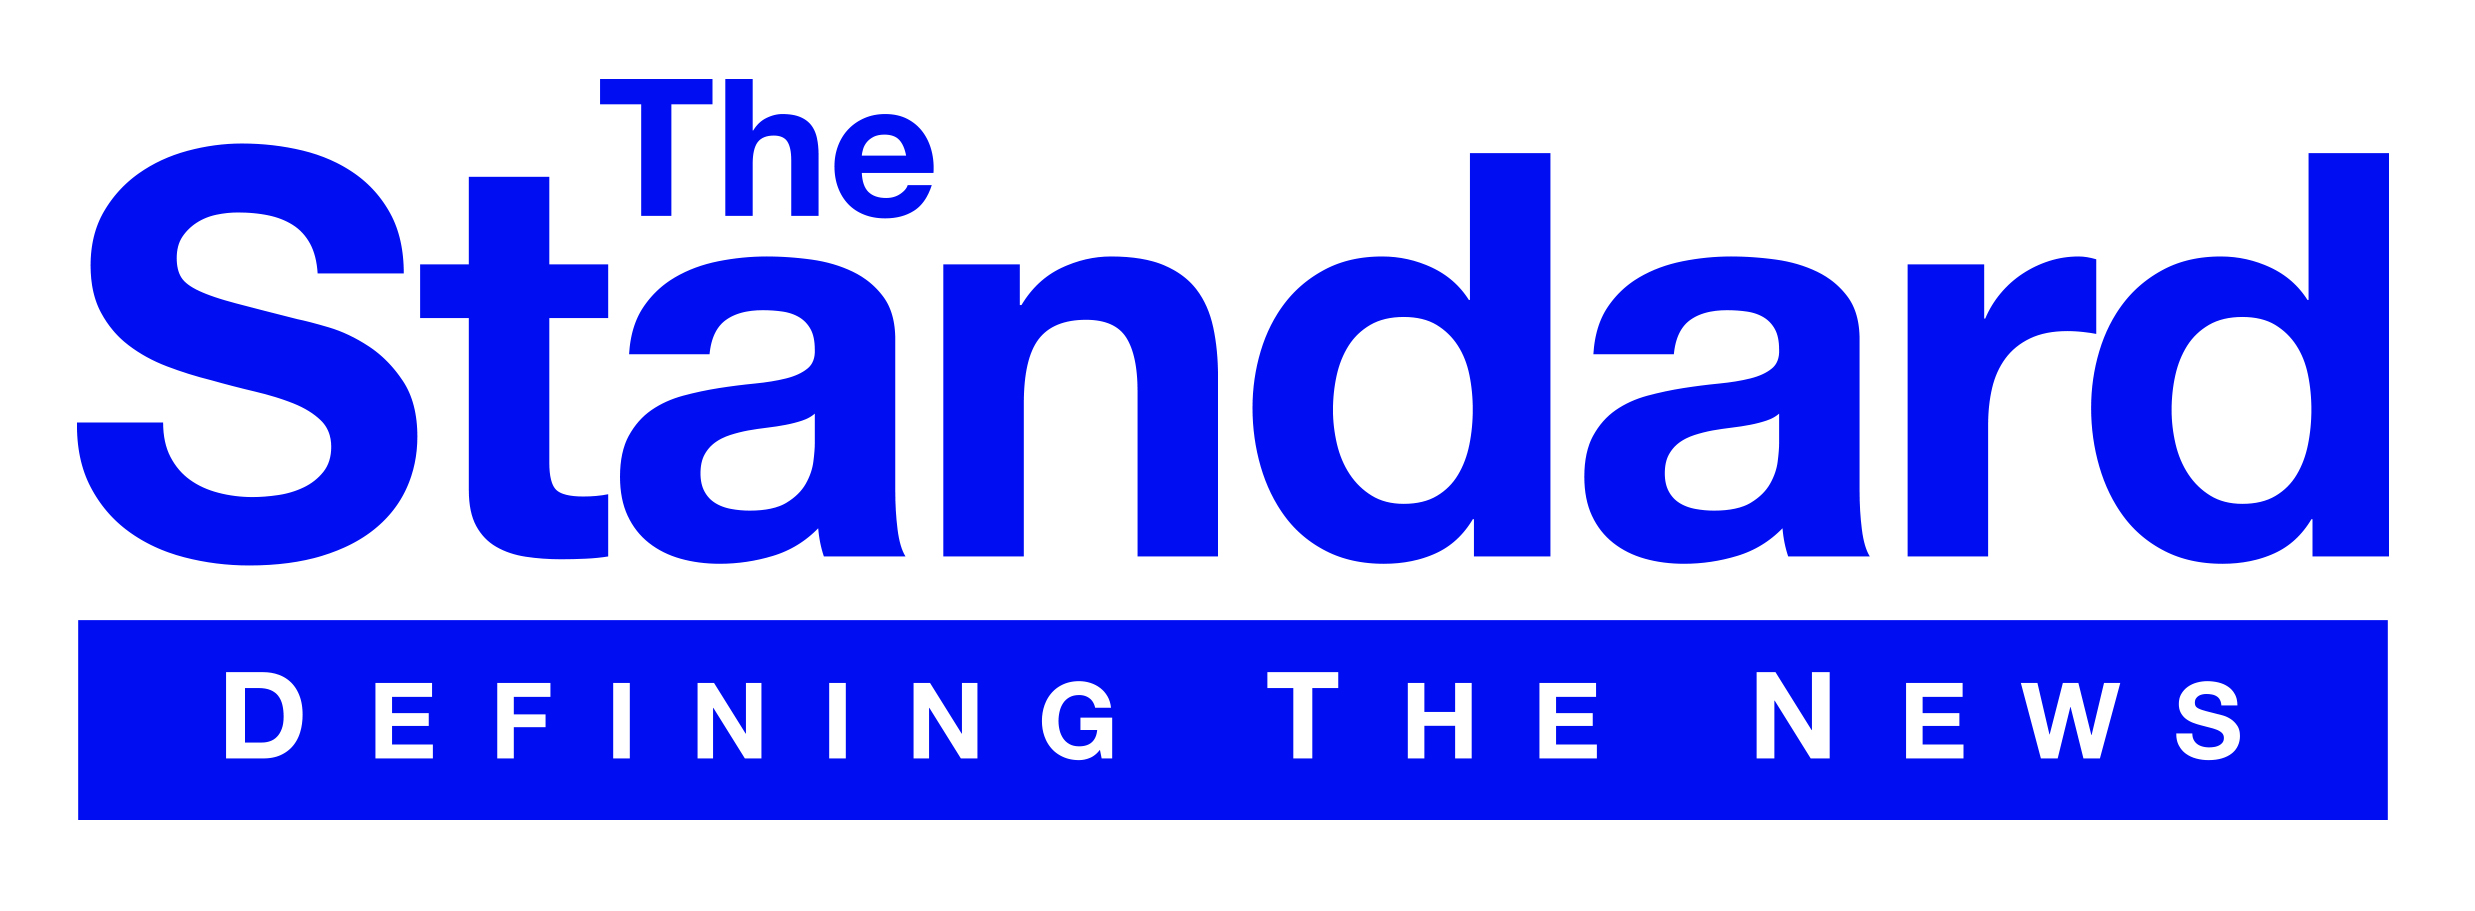 The Standard logo.jpg